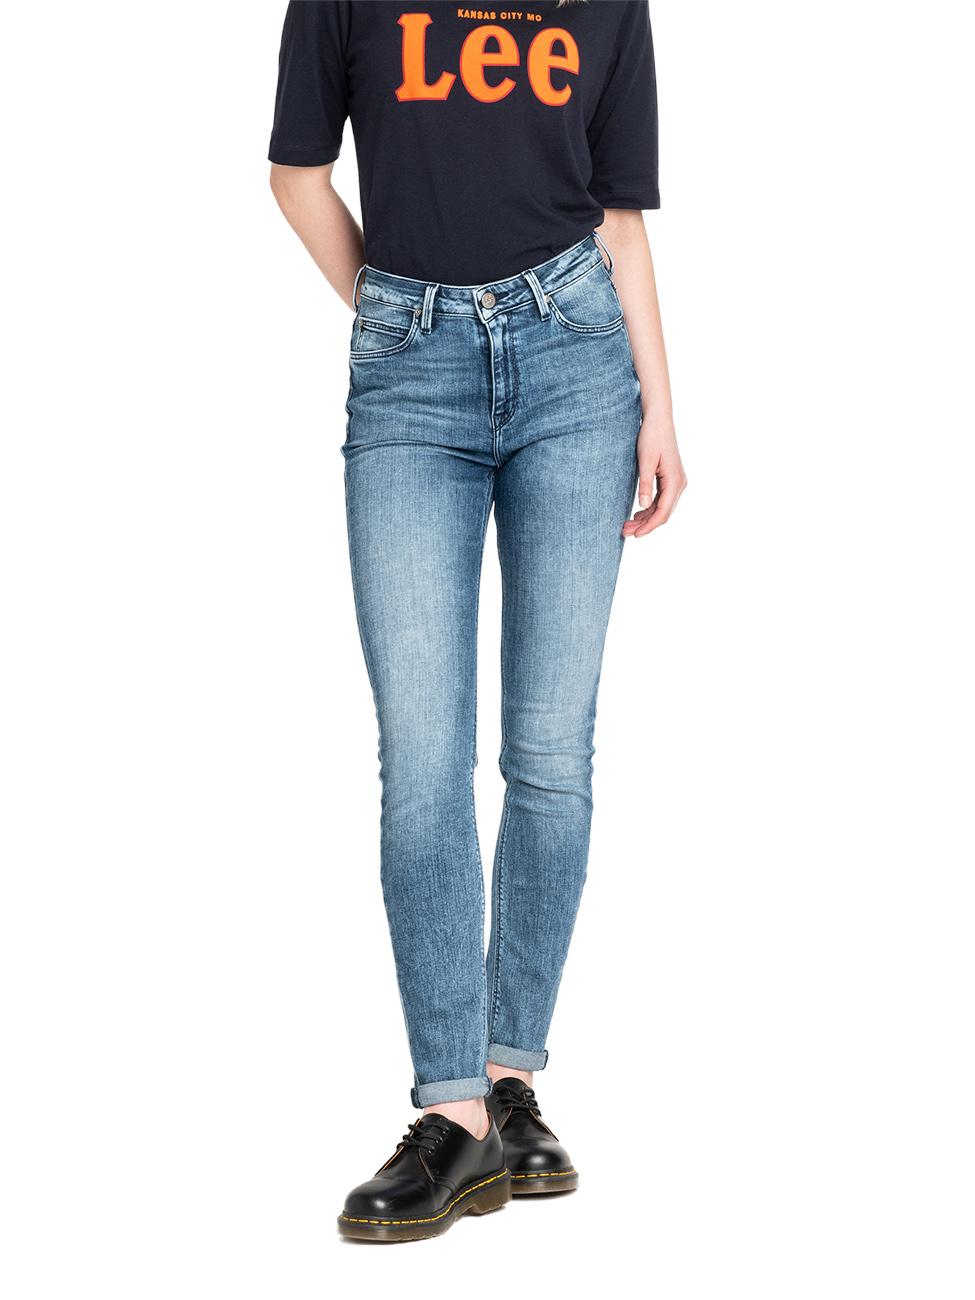 Lee Damen Jeans Jeanshose Stretch Scarlett High Skinny Fit  - Blau - Cool Daze